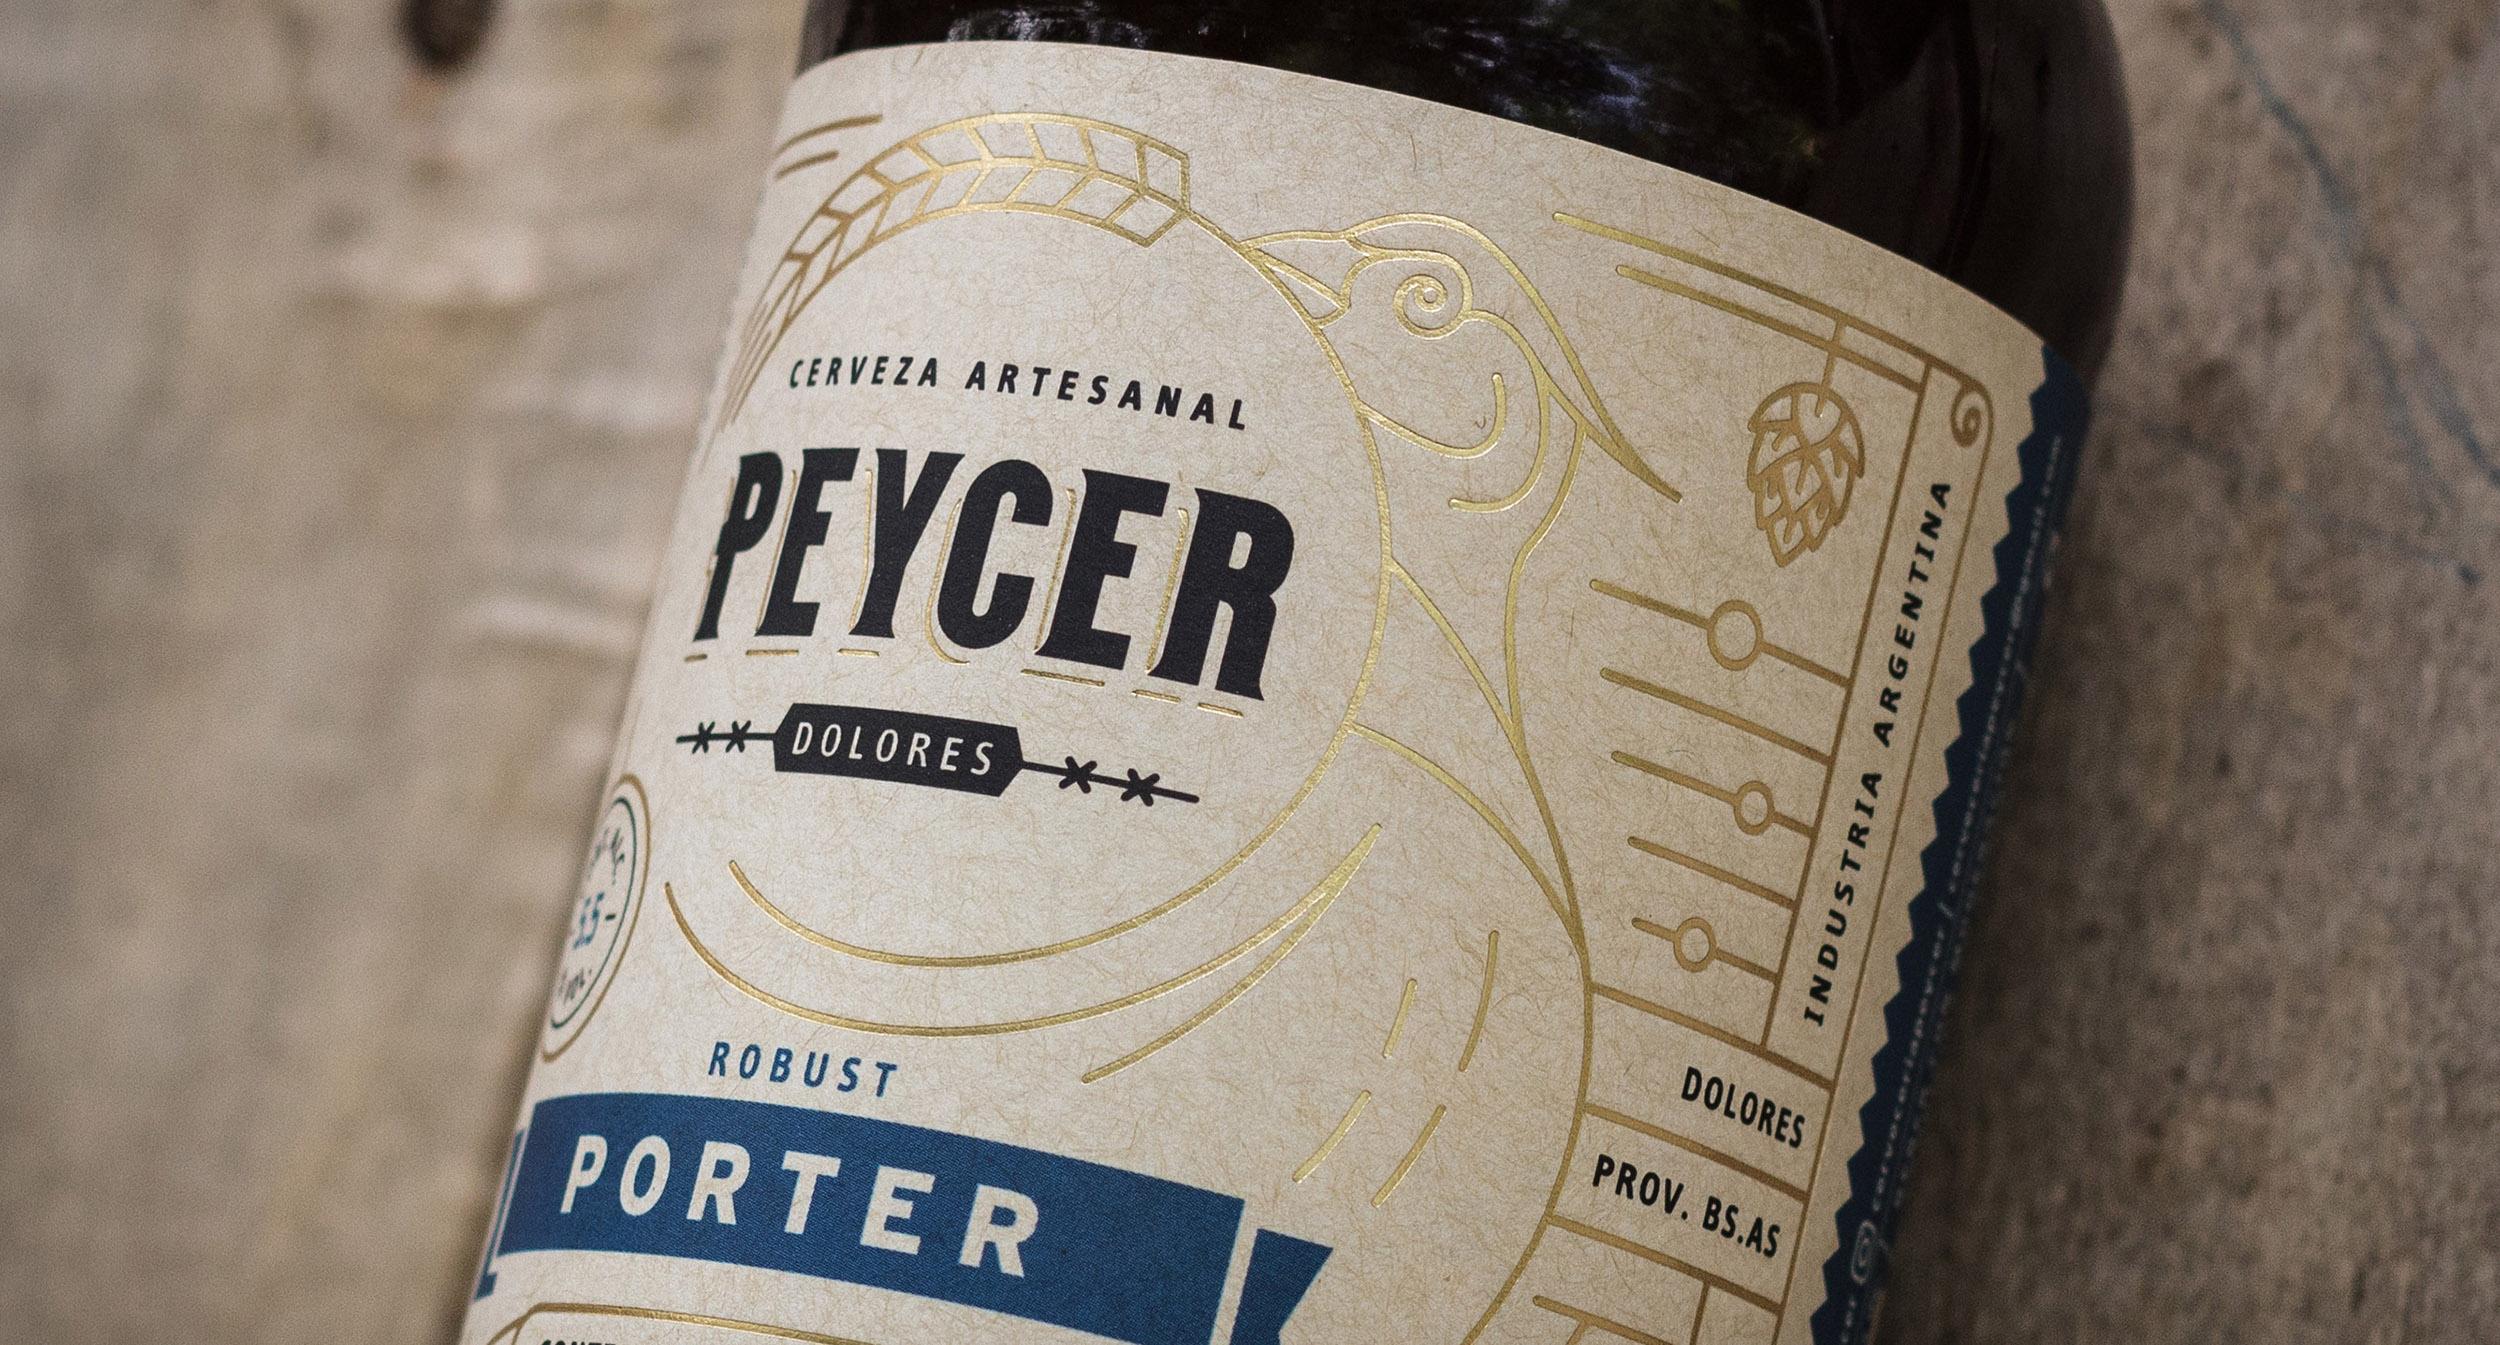 Matias Harina - Paycer Craft Beer2.jpg